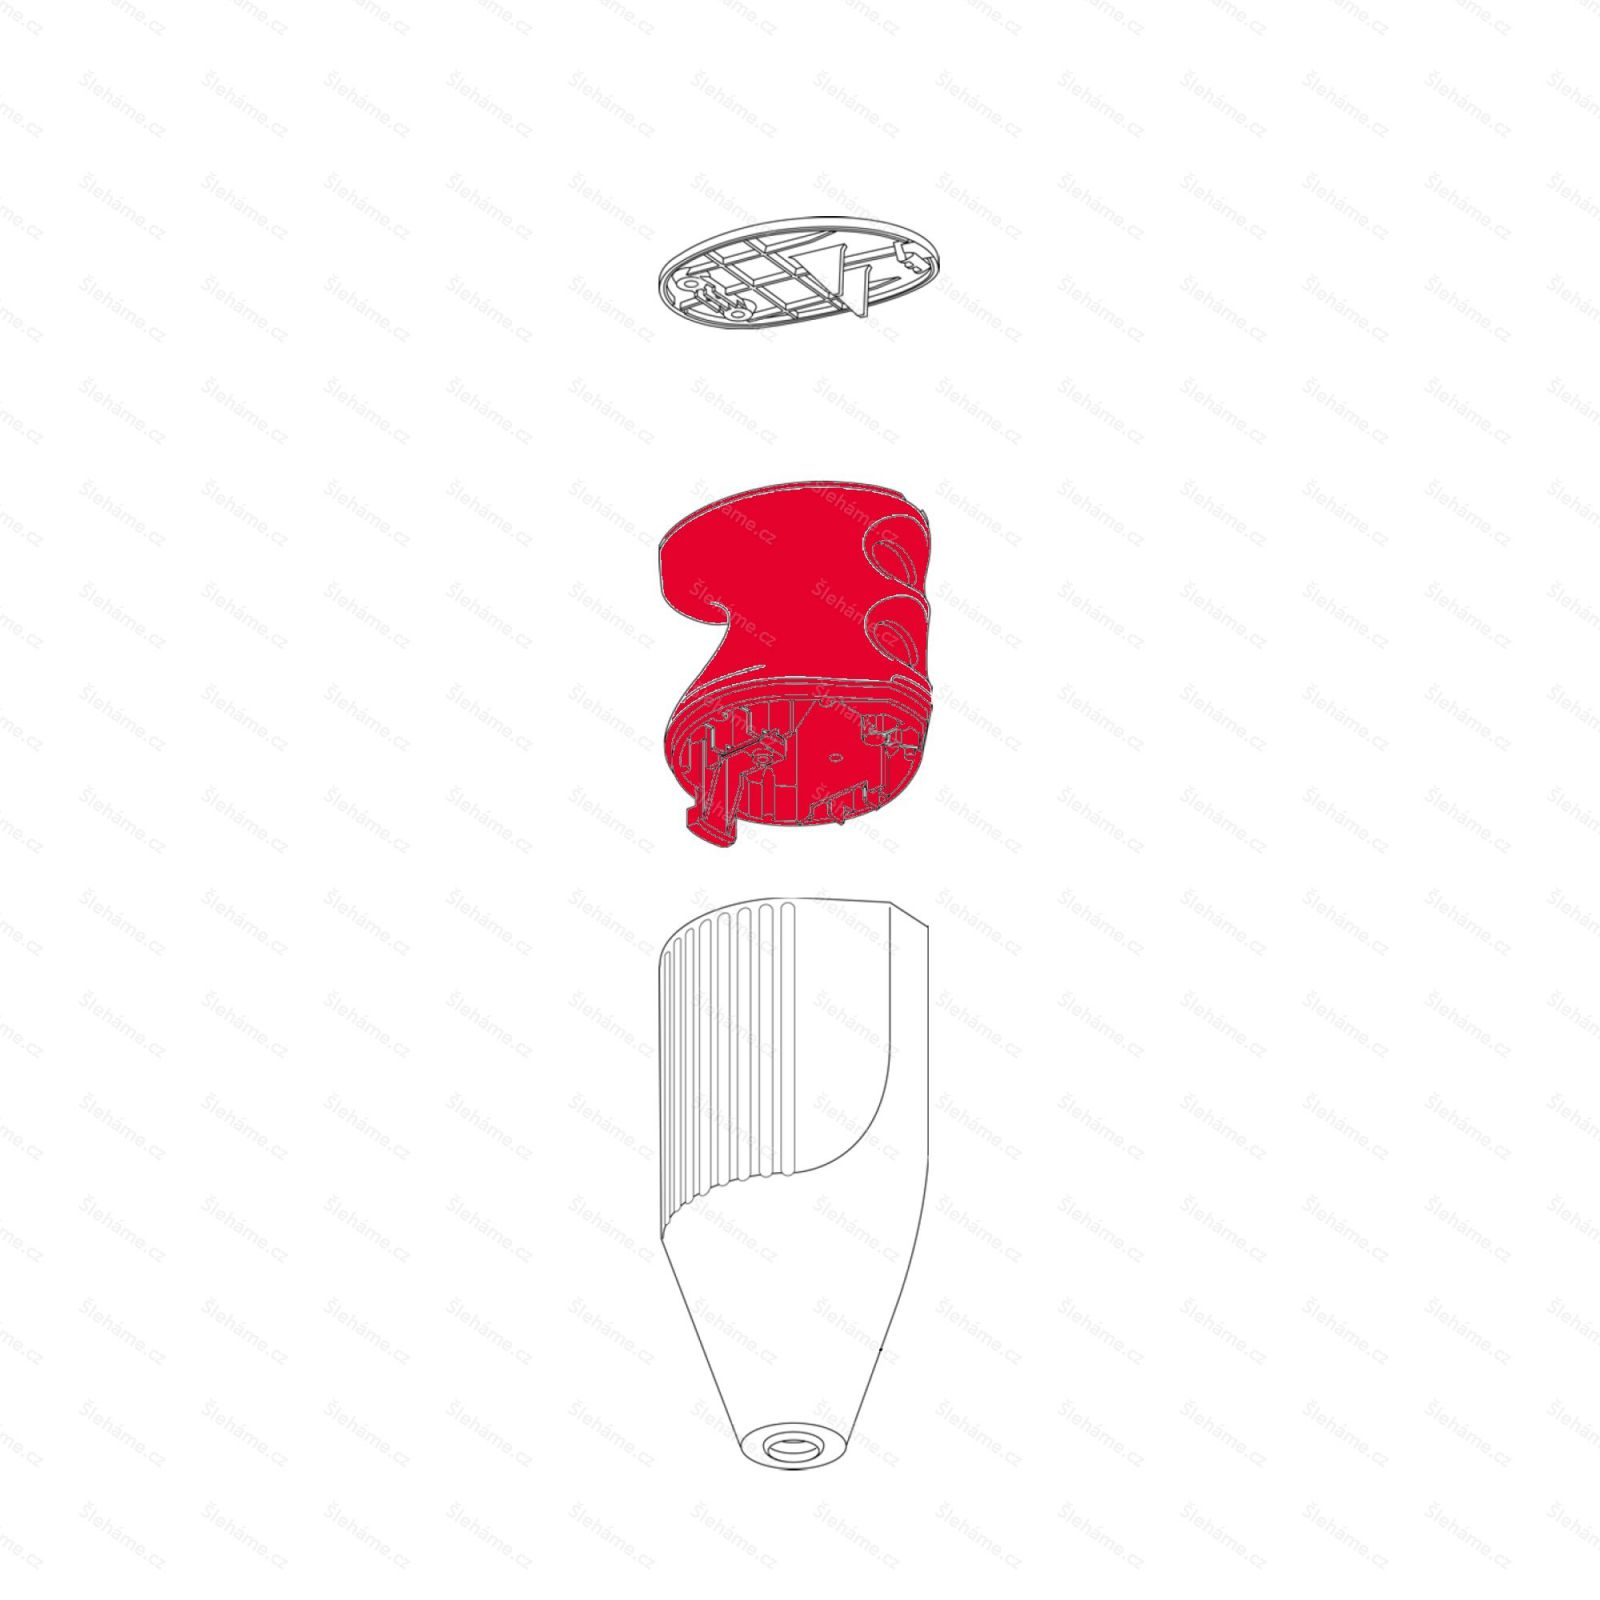 Rukojeť mixéru Bamix model C, červená metalíza